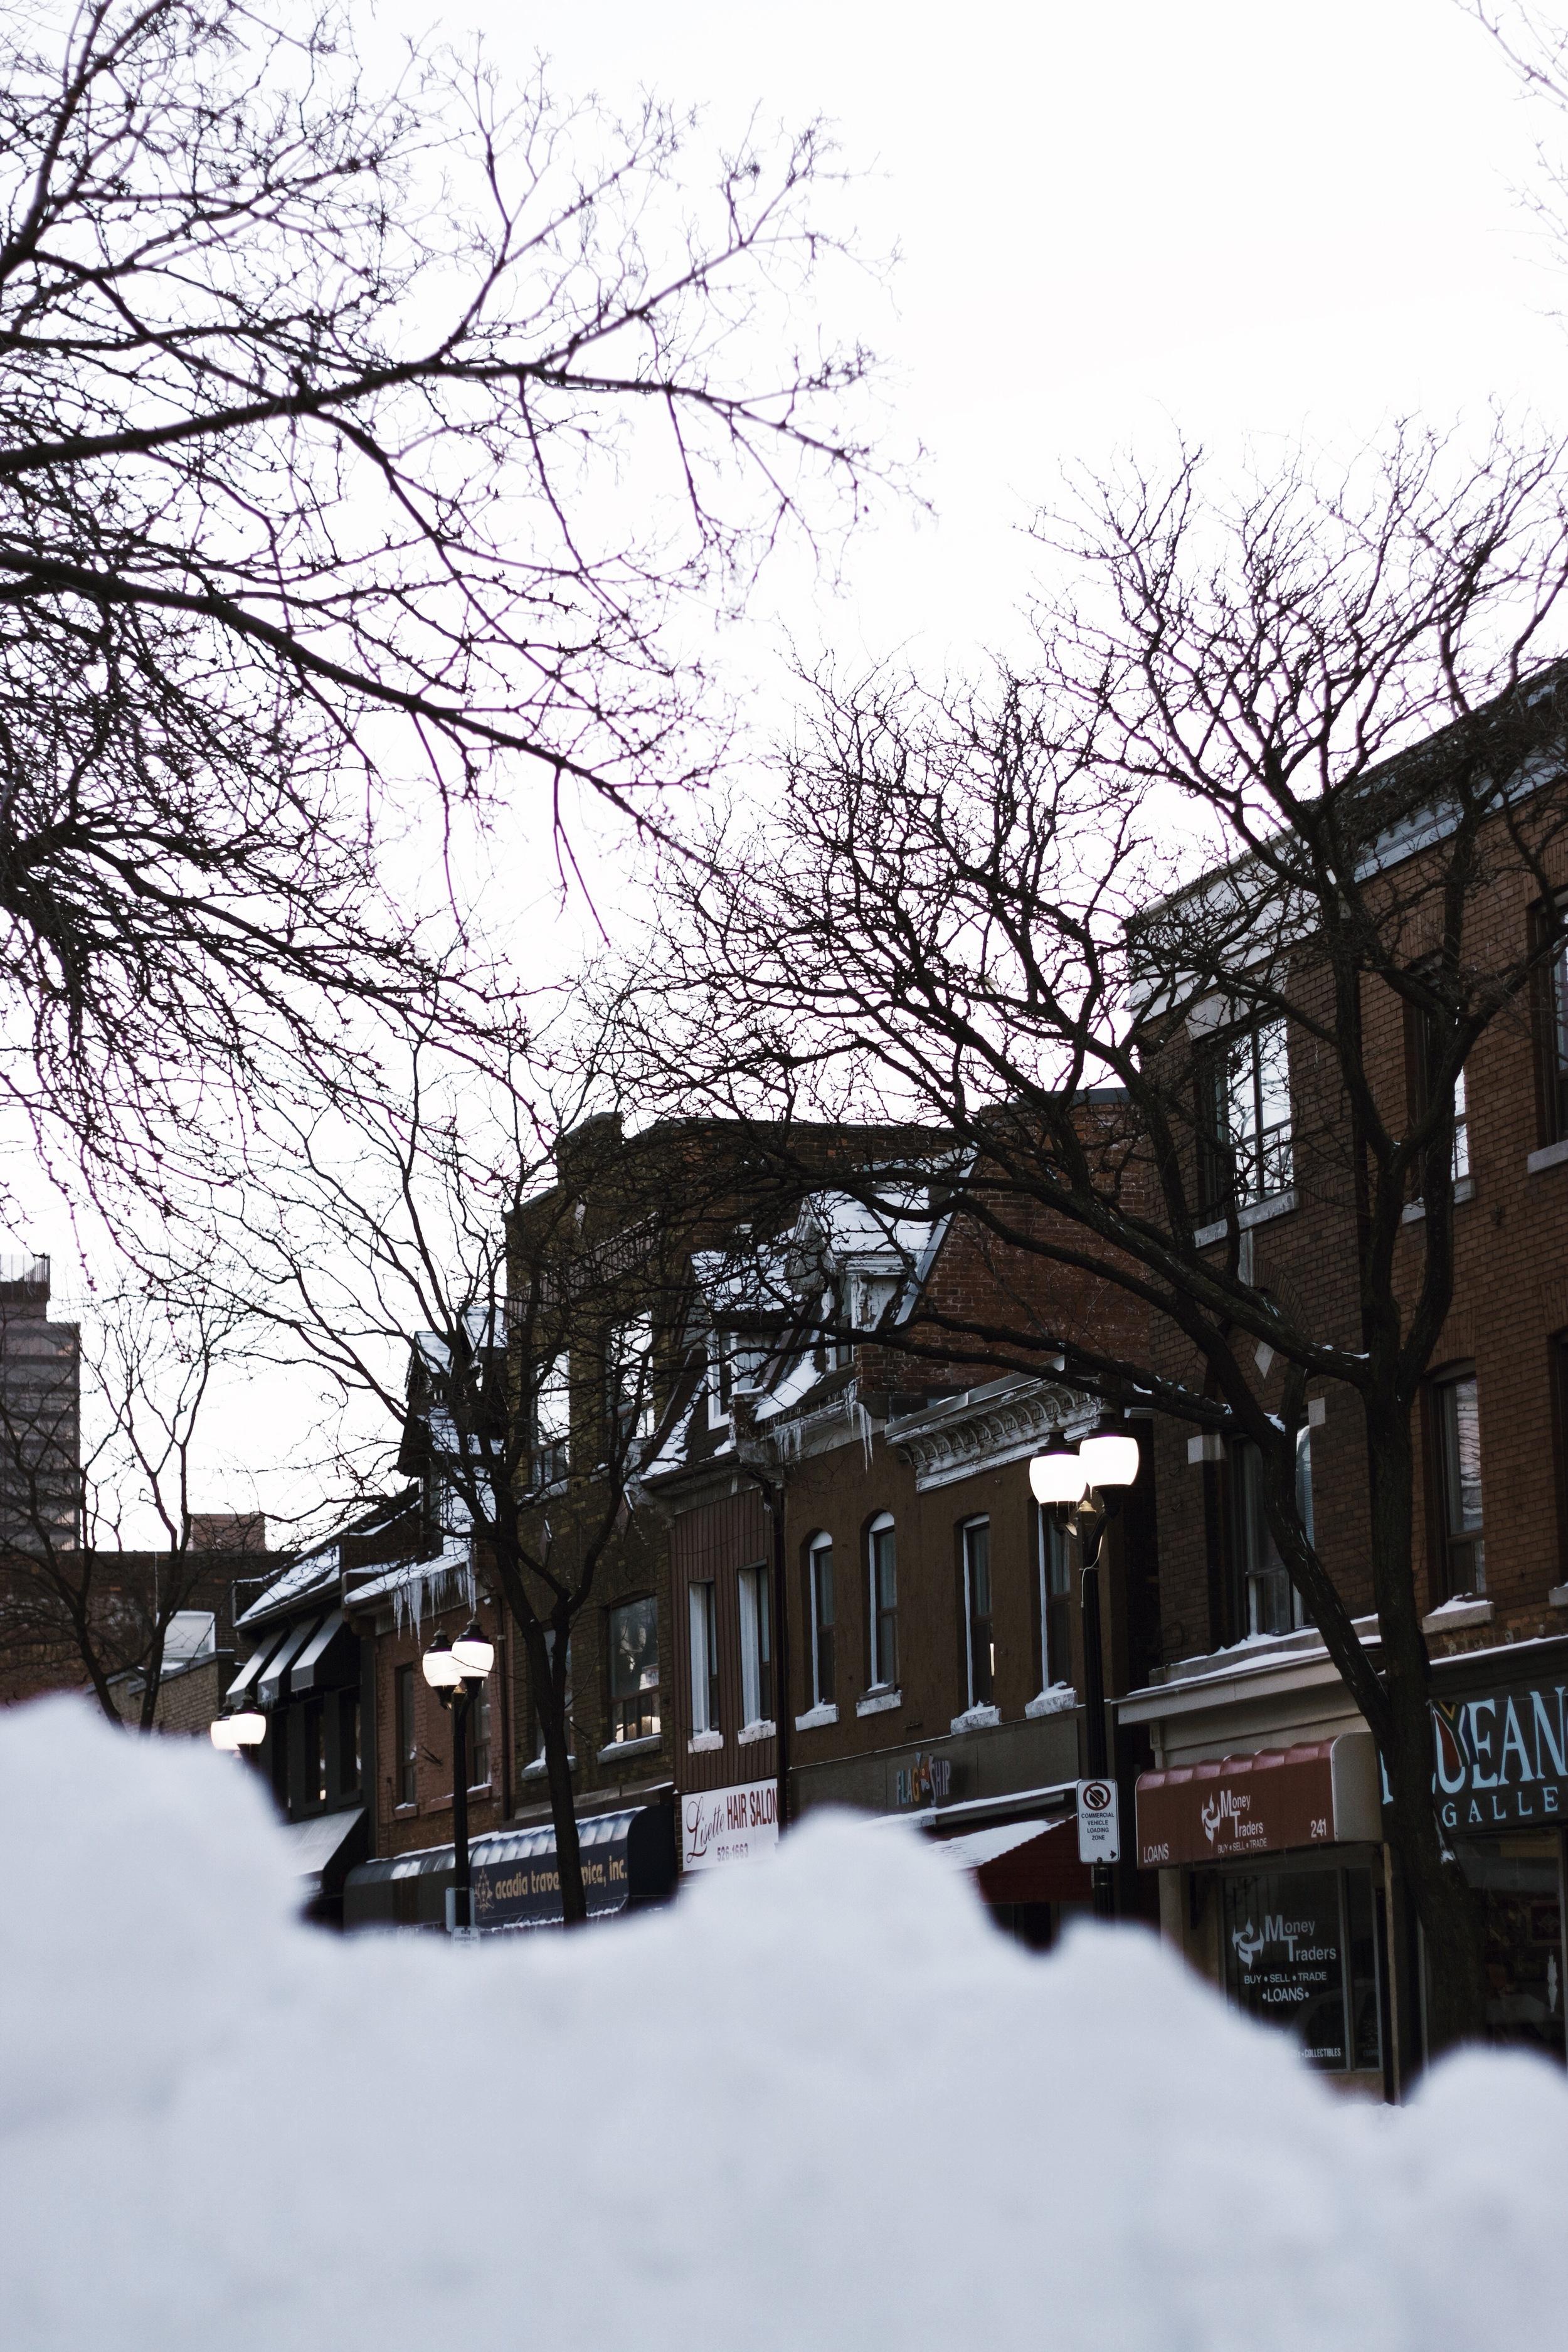 Hamilton buildings in my hood.